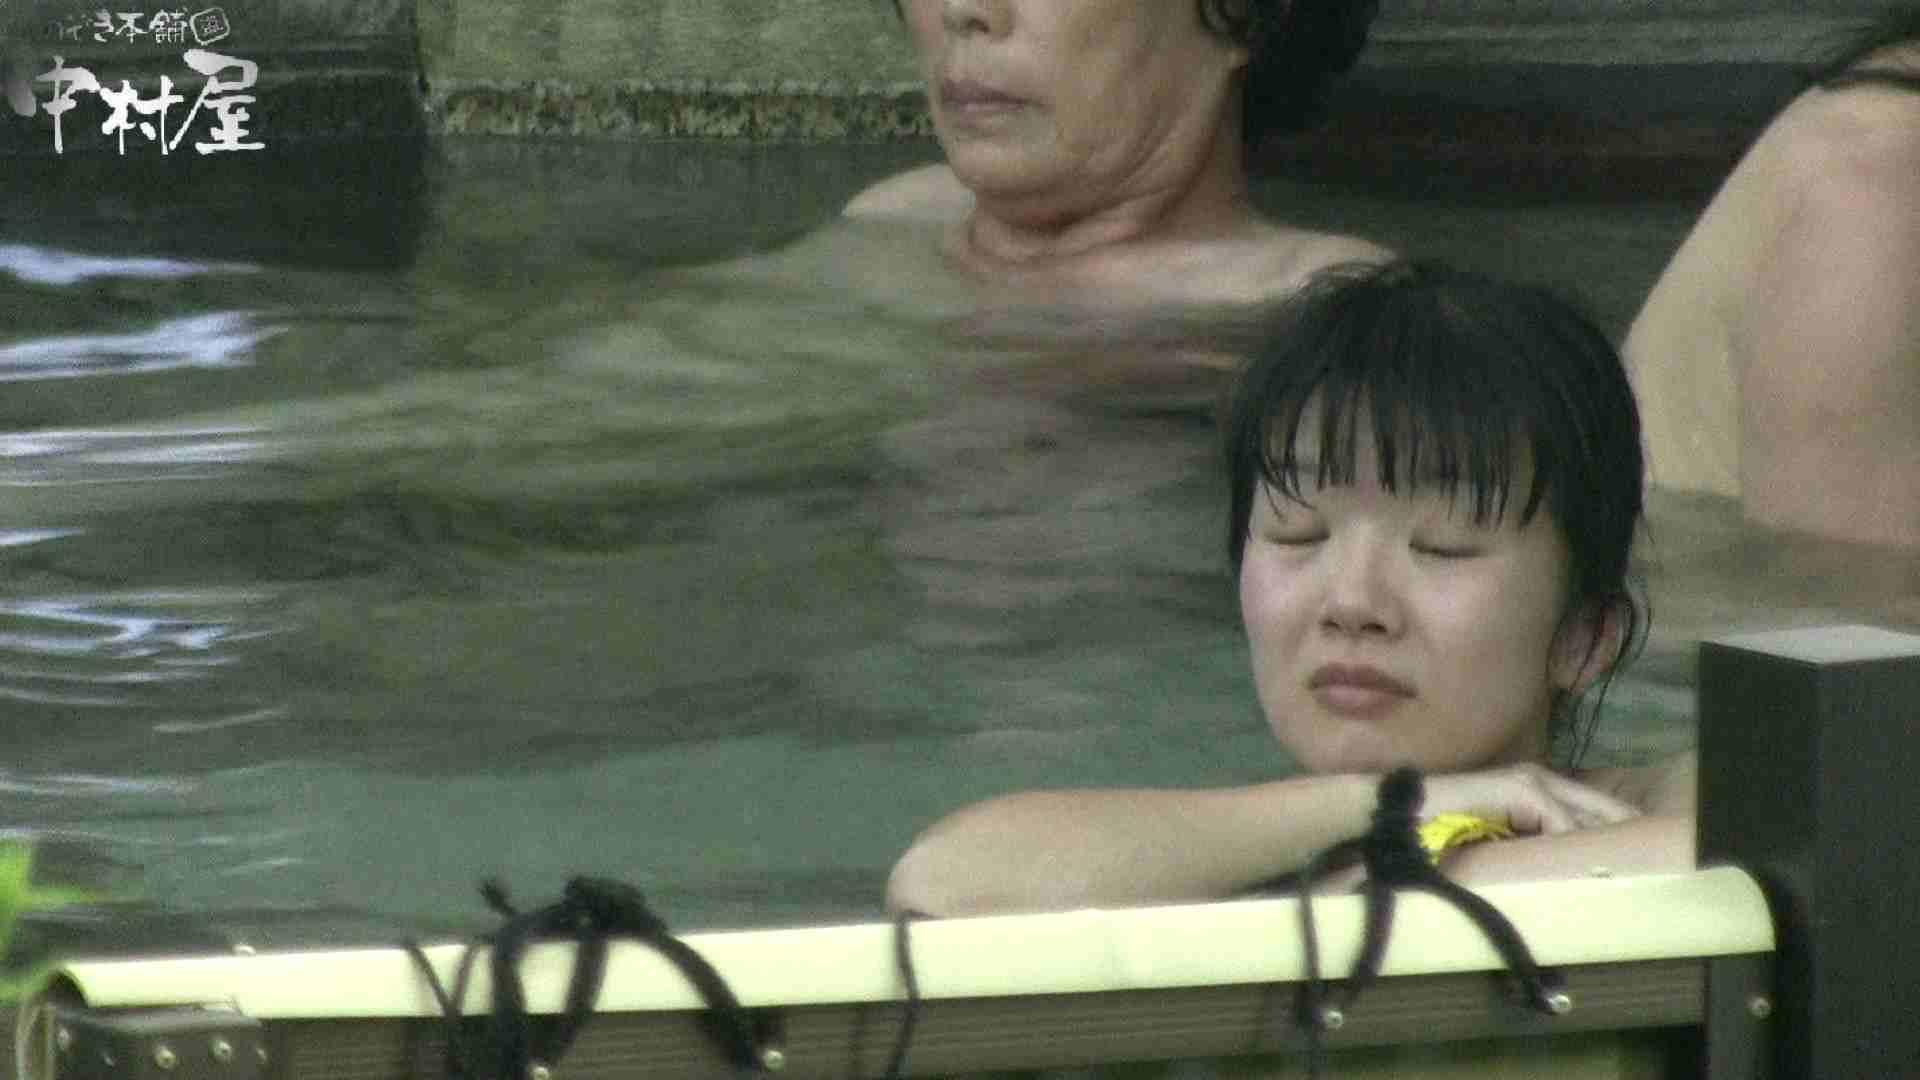 Aquaな露天風呂Vol.904 美しいOLの裸体 オメコ動画キャプチャ 103pic 32